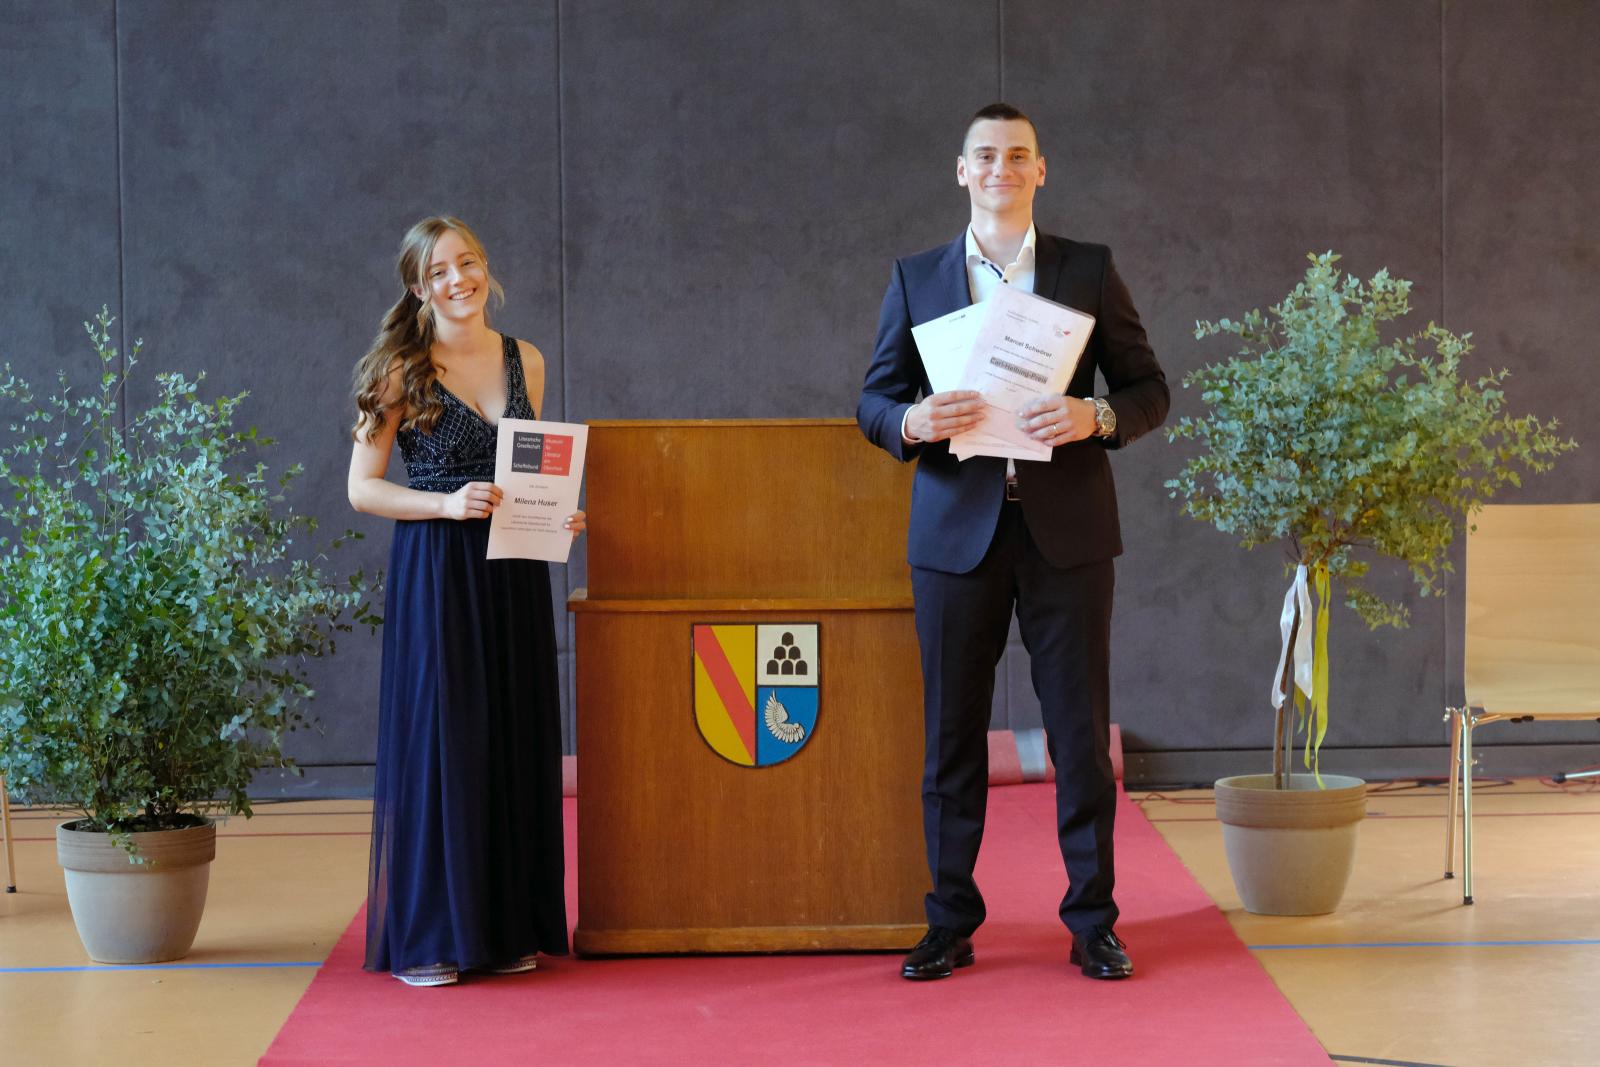 (Maik Uhlig, La-Photo.de): Scheffelpreisträgerin Milena Huser (li), Marcel Schwörer (re) bester Abiturdurchschnitt, Carl-Helbing-Preis, Goethe-Preis, Ökonomie-Schulpreis Südwestmetall